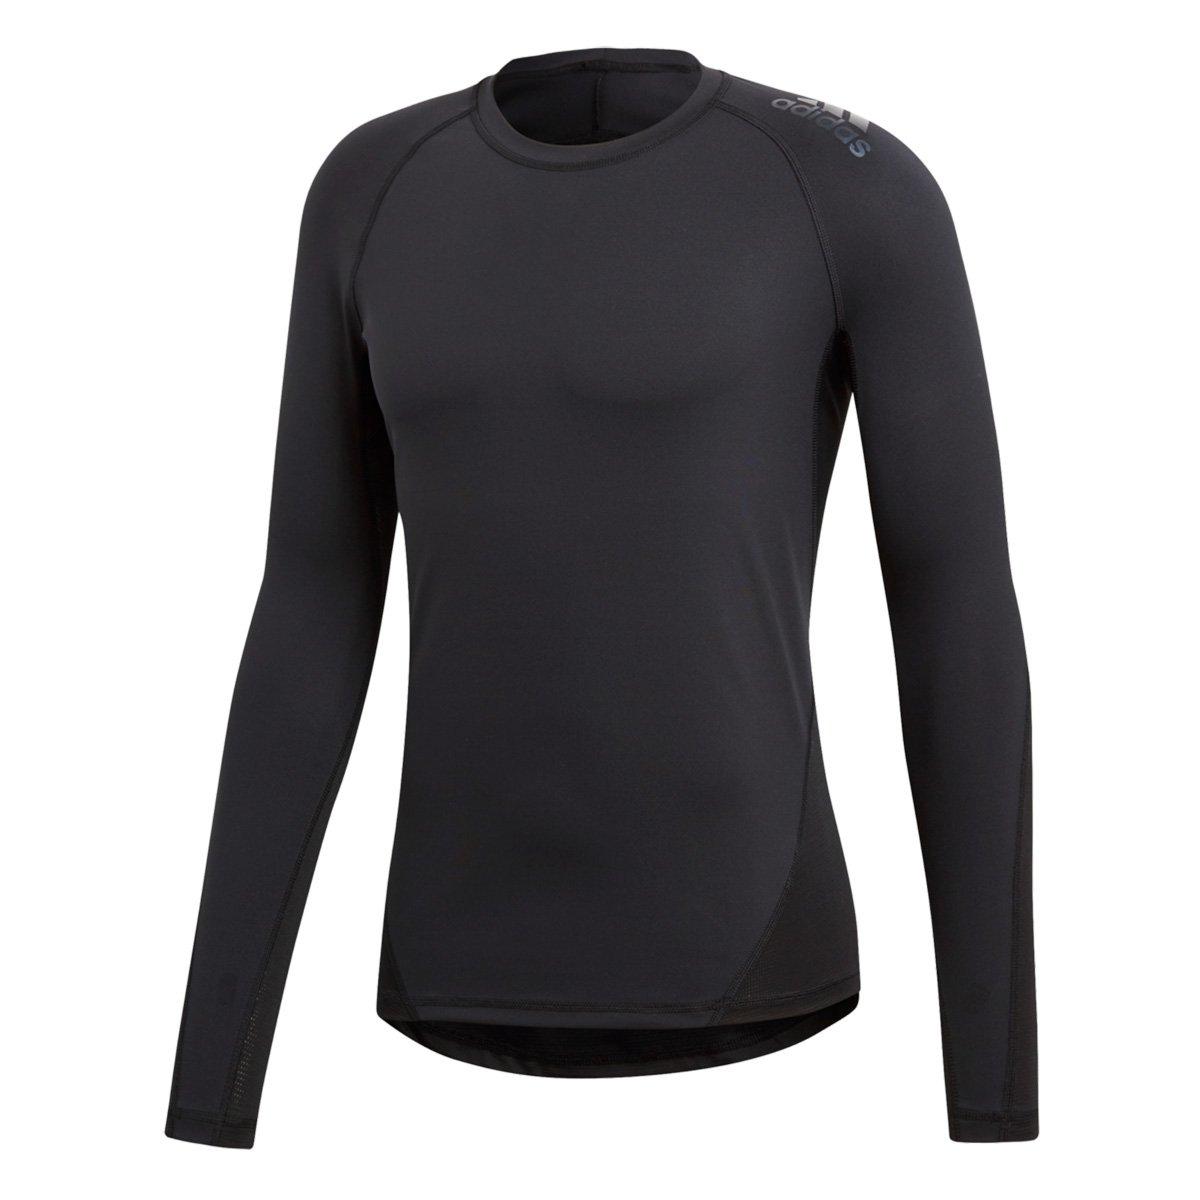 Camiseta Adidas DNA Sport Manga Longa Masculina - Compre Agora ... e3d0934704768